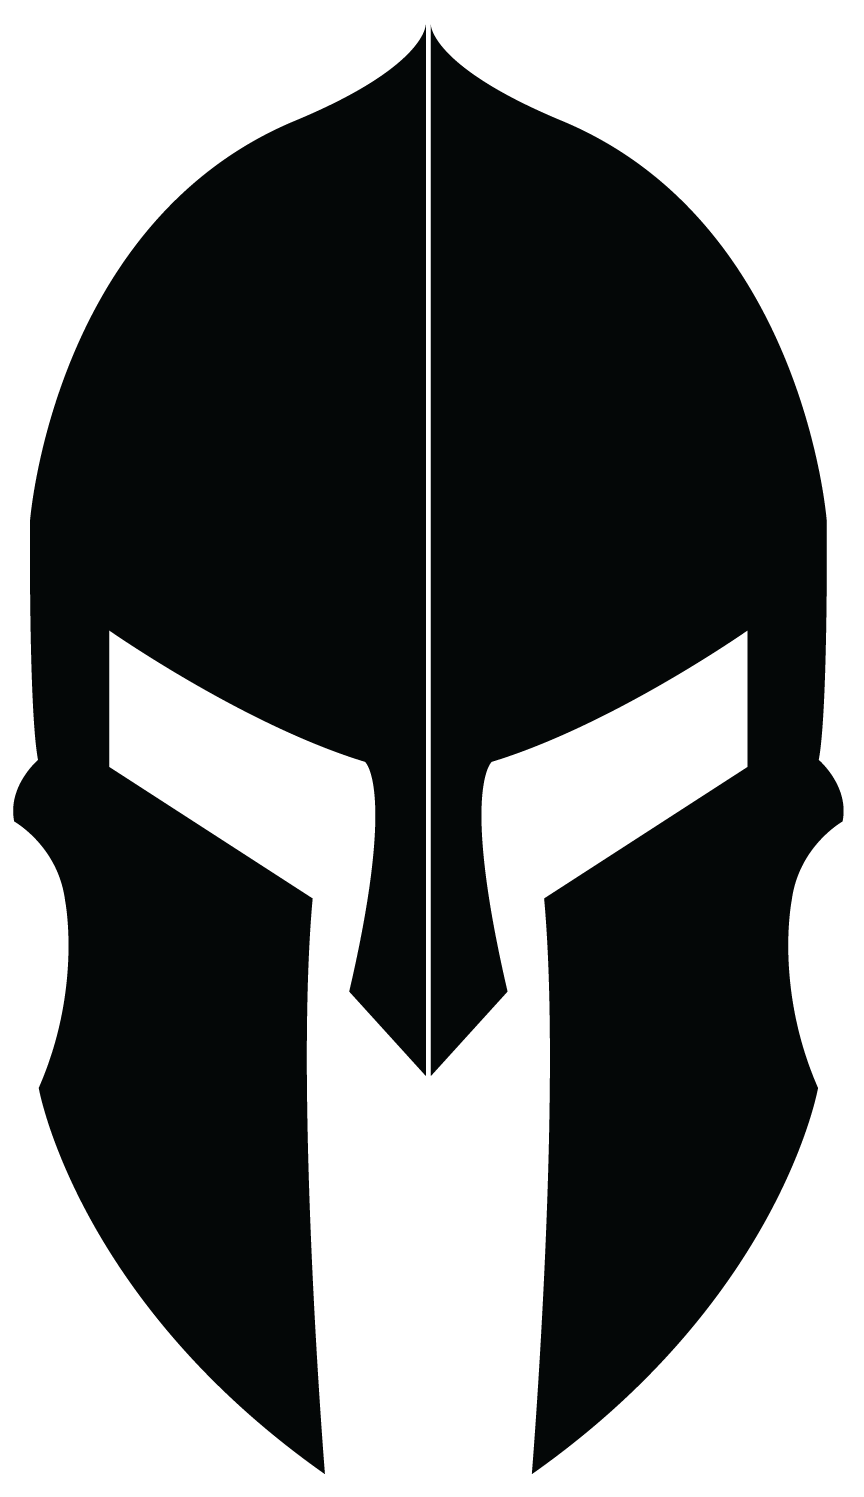 Star wars rebel helmet clipart banner transparent Logo design for Spartan Helmet | Portfolio | Pinterest | Spartan ... banner transparent